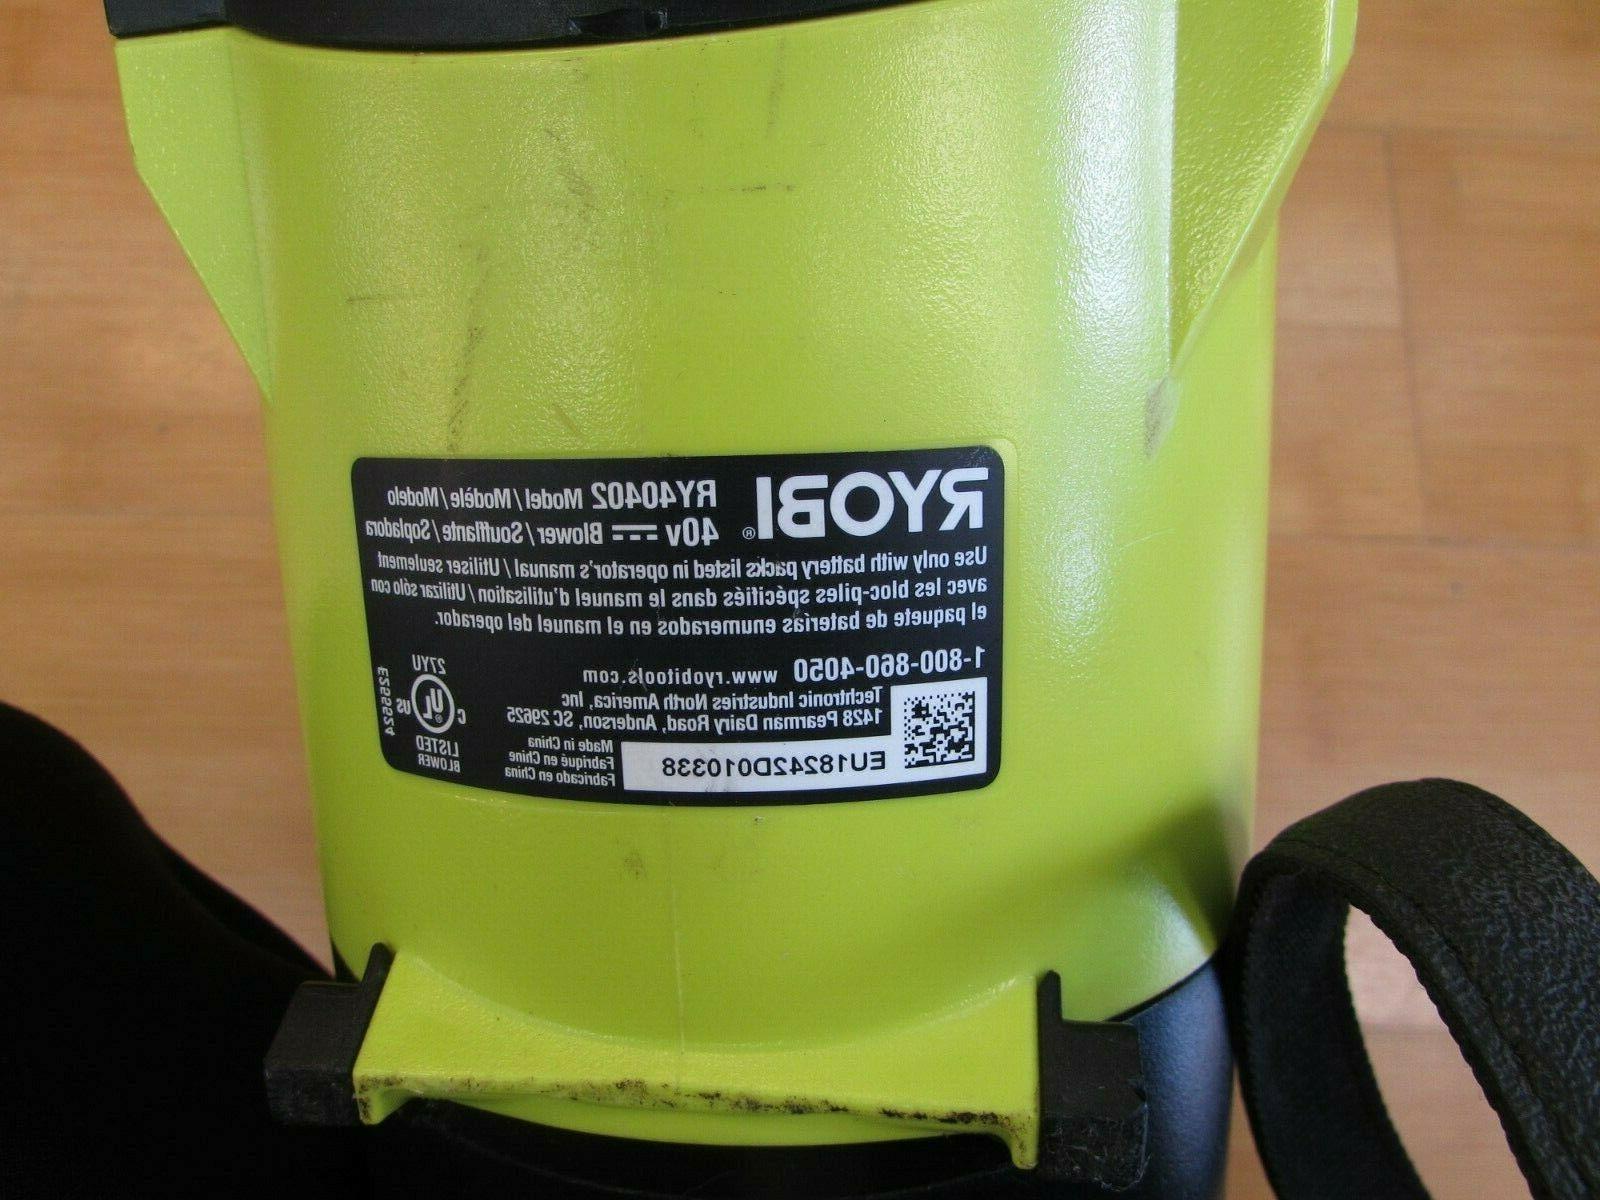 RYOBI RY40402 155MPH 40V LI-ION FAN BLOWER BATTERY